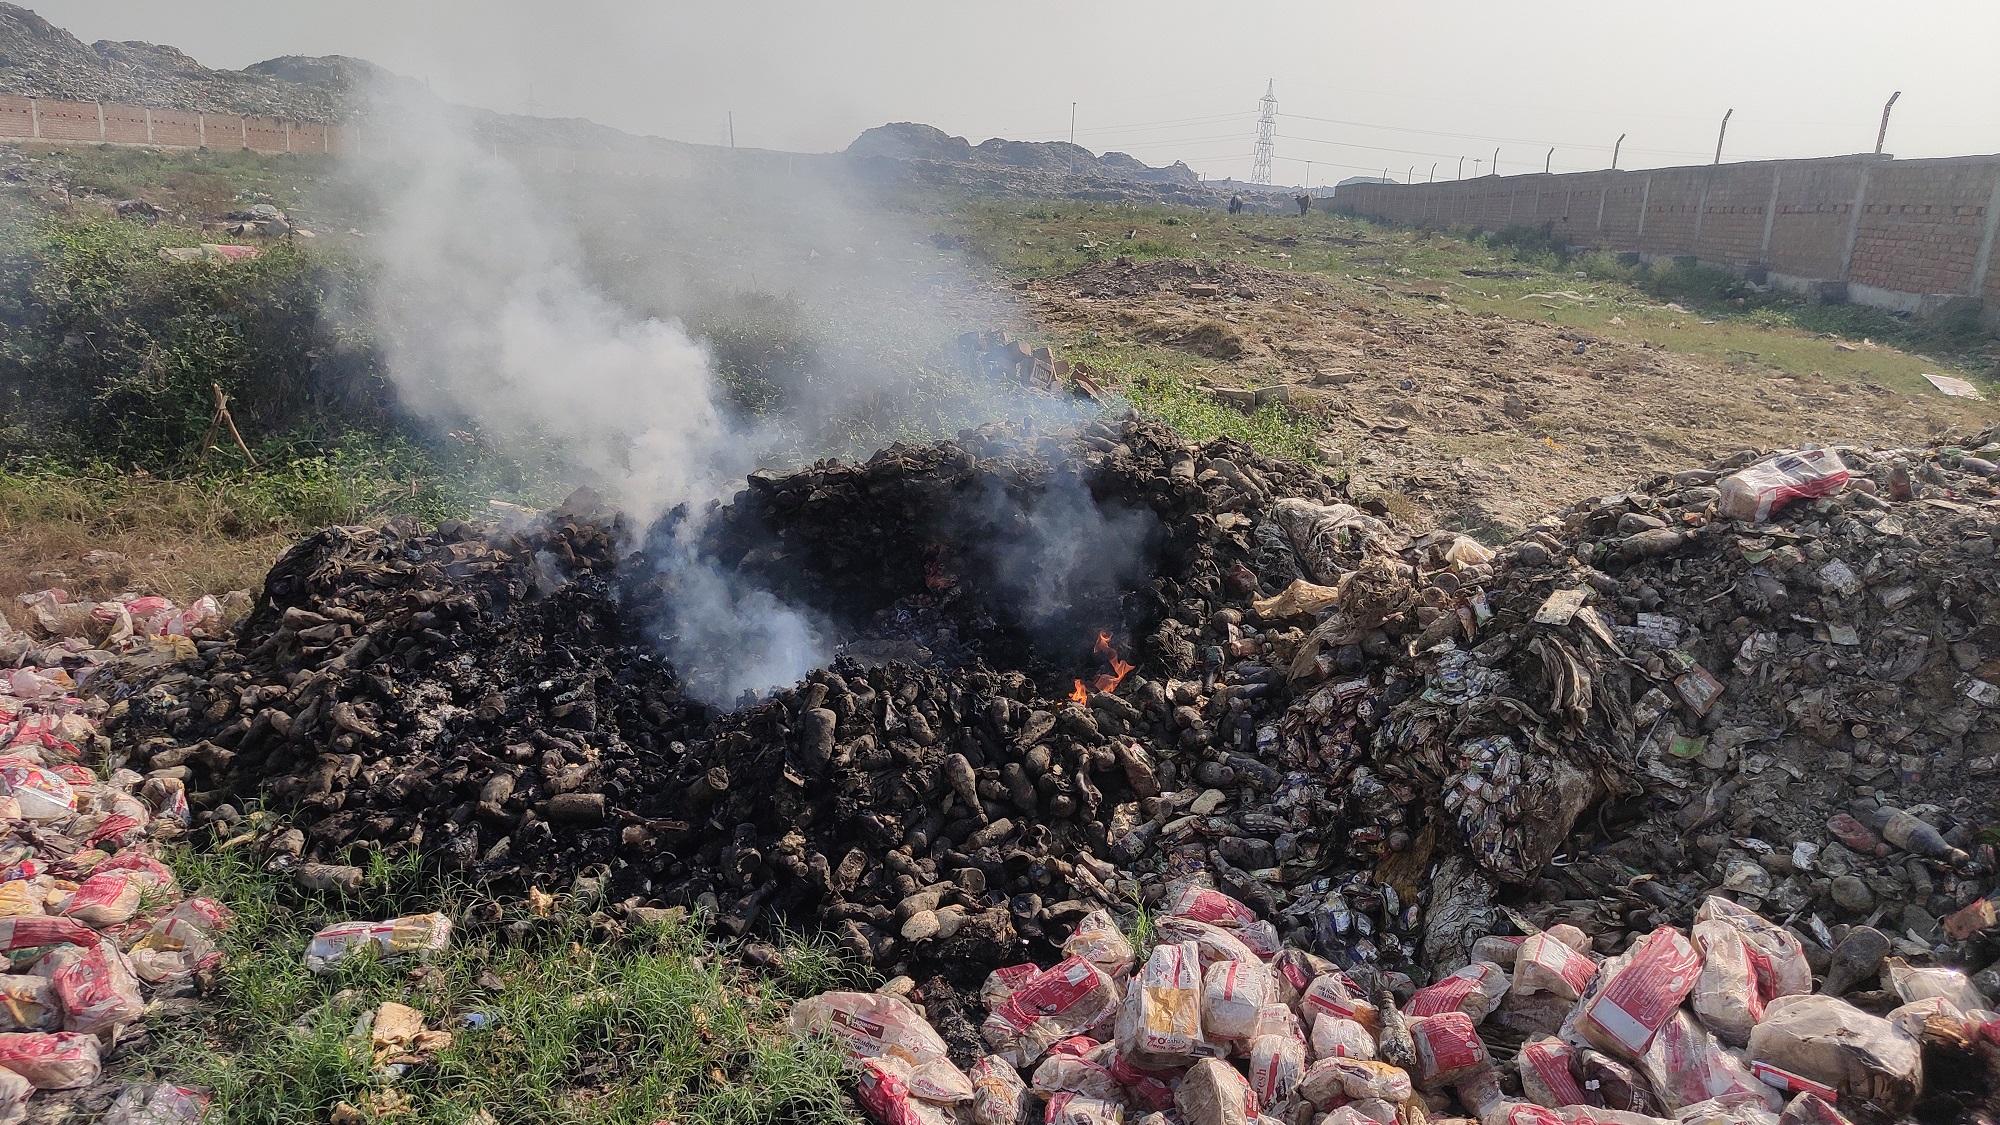 Solid waste is burt openly in air in Patna disregarding oil norms Photo Samir Verma